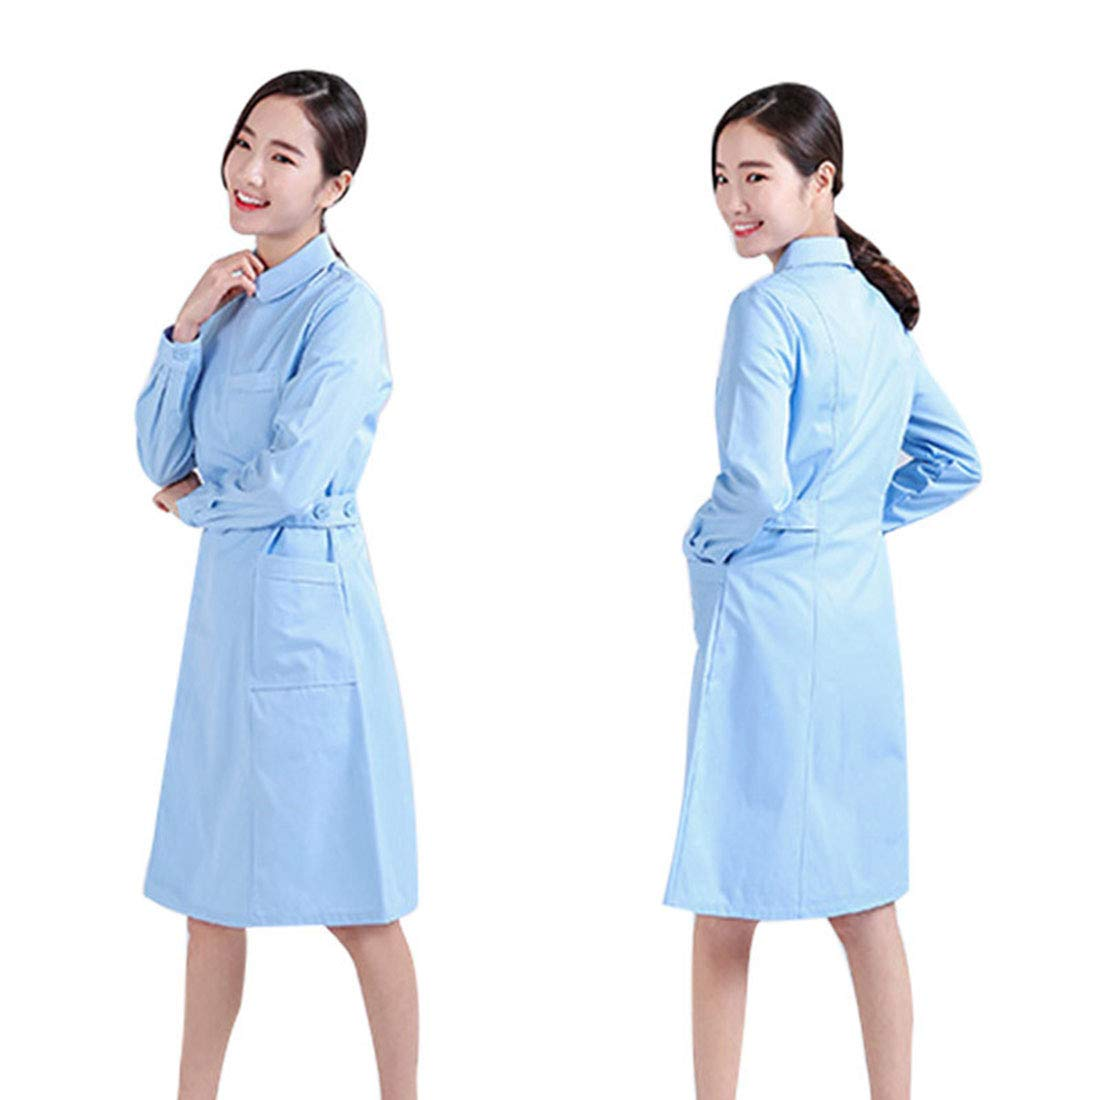 Bata de Laboratorio de Manga Larga con Cintura Ajustable para Mujer, Uniforme Médico Enfermera Ajustado, Ropa Quirúrgica Médico Laboratorio Enfermera ...